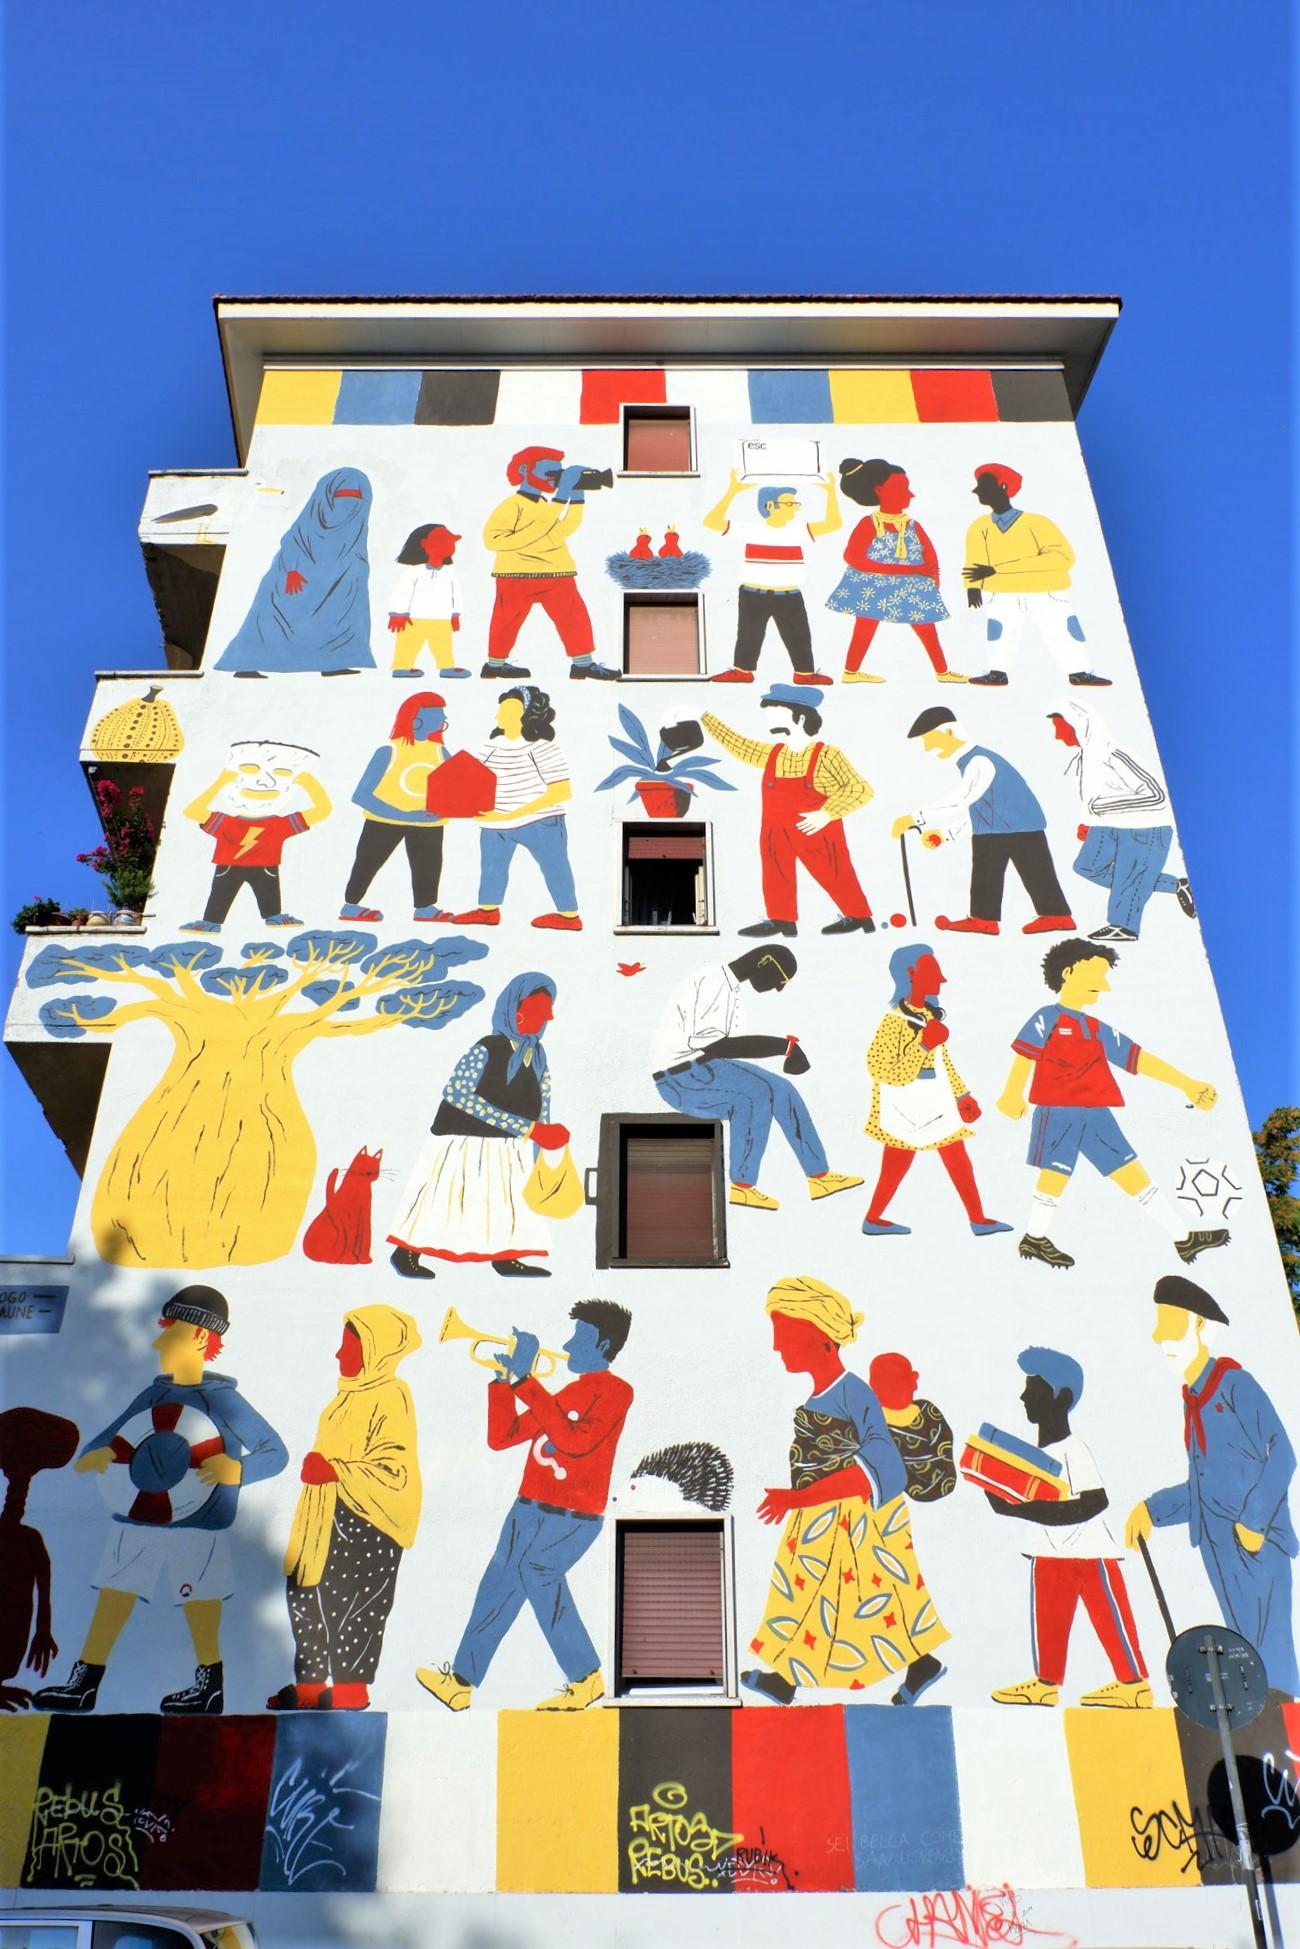 luogo comune street art san lorenzo